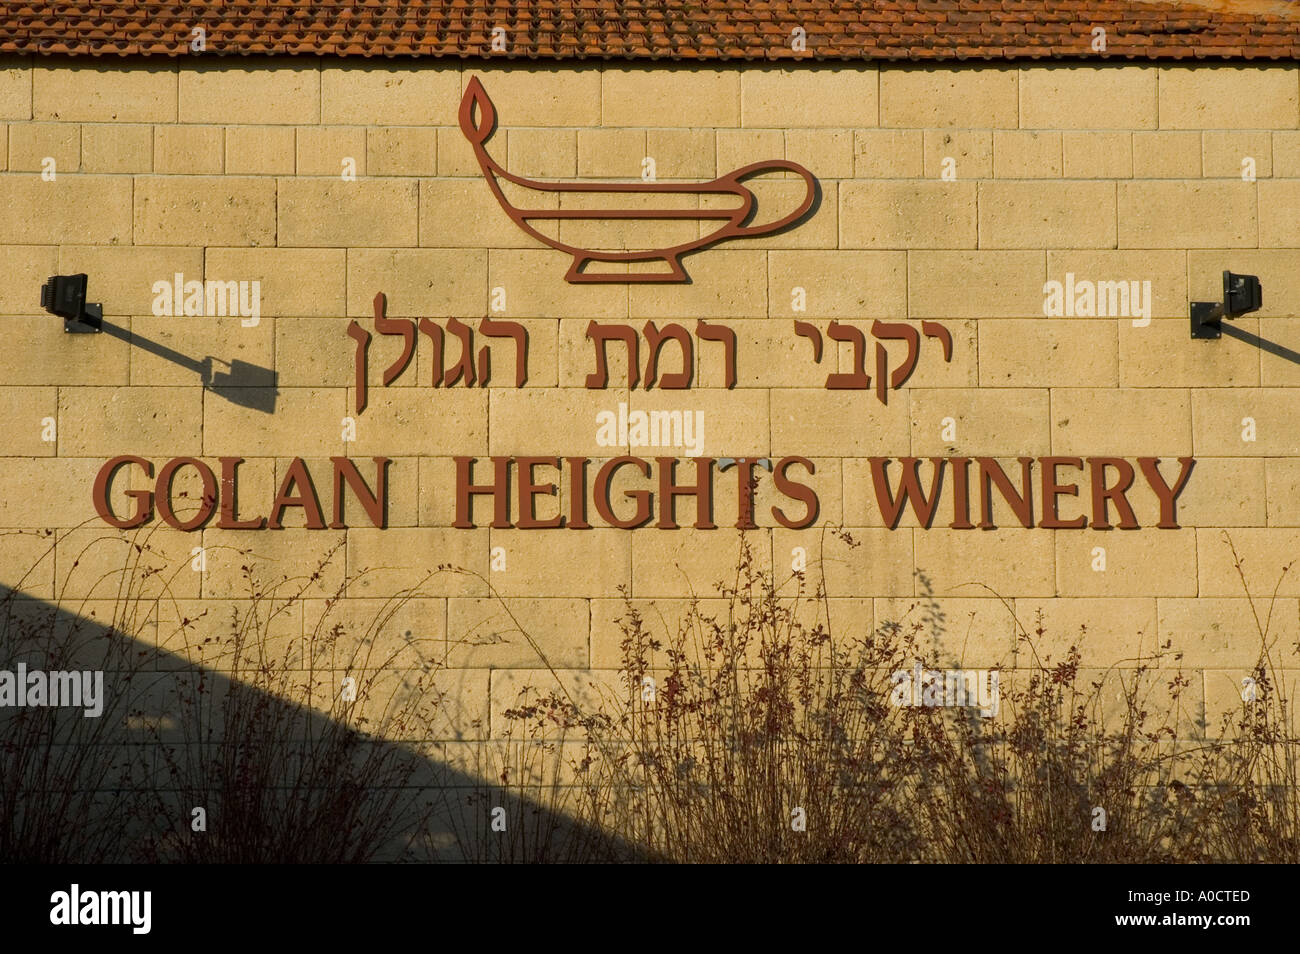 Golan Heights Israel Winery Stock Photos & Golan Heights Israel ...